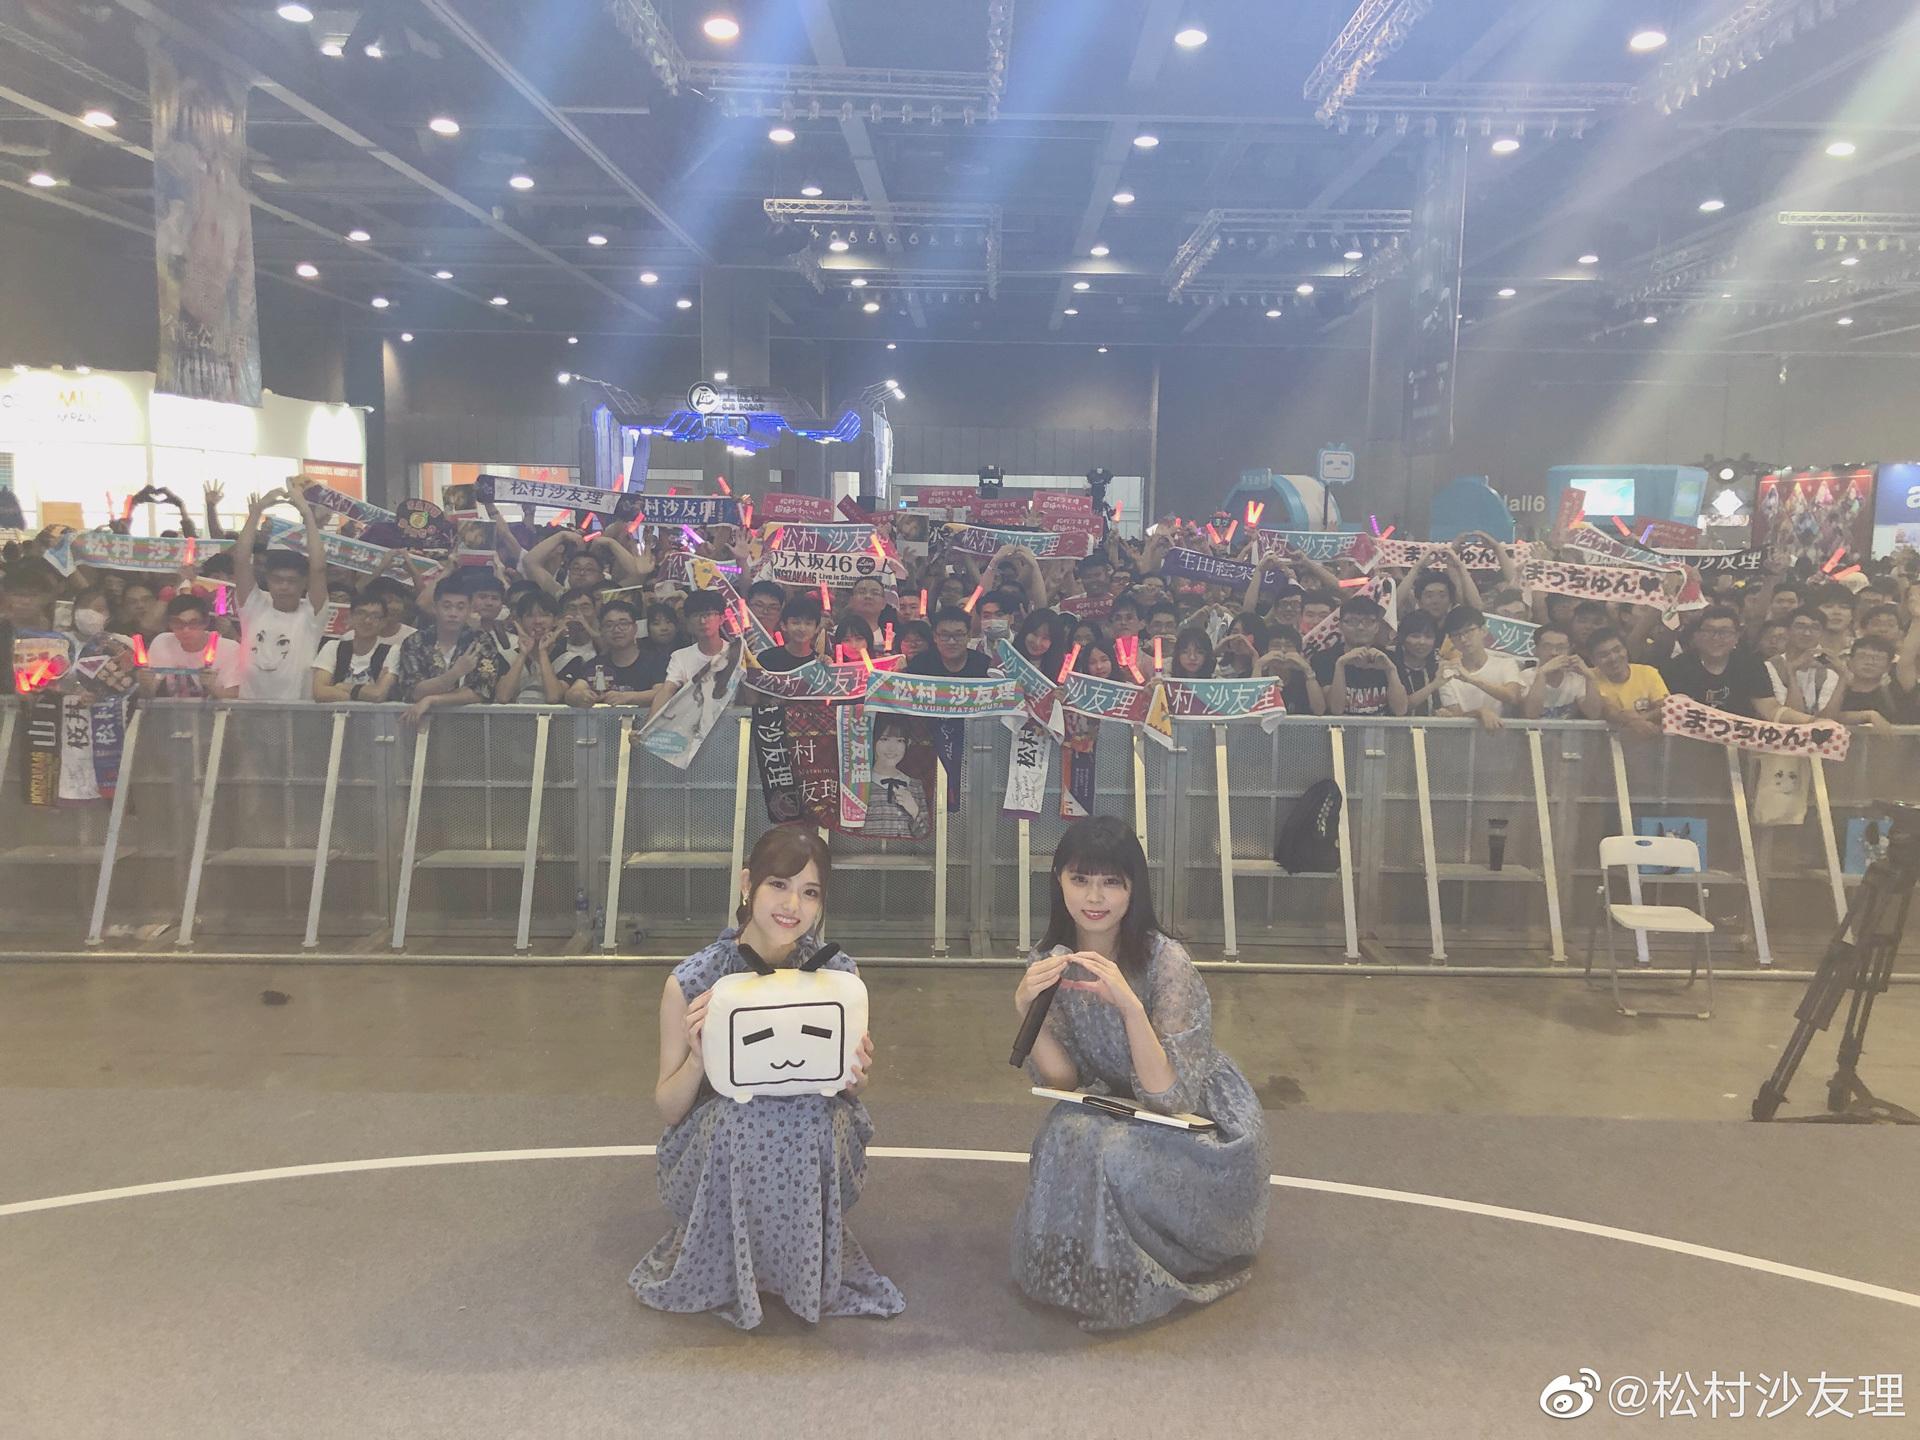 松村沙友理 BILIBILI WORLD 2019